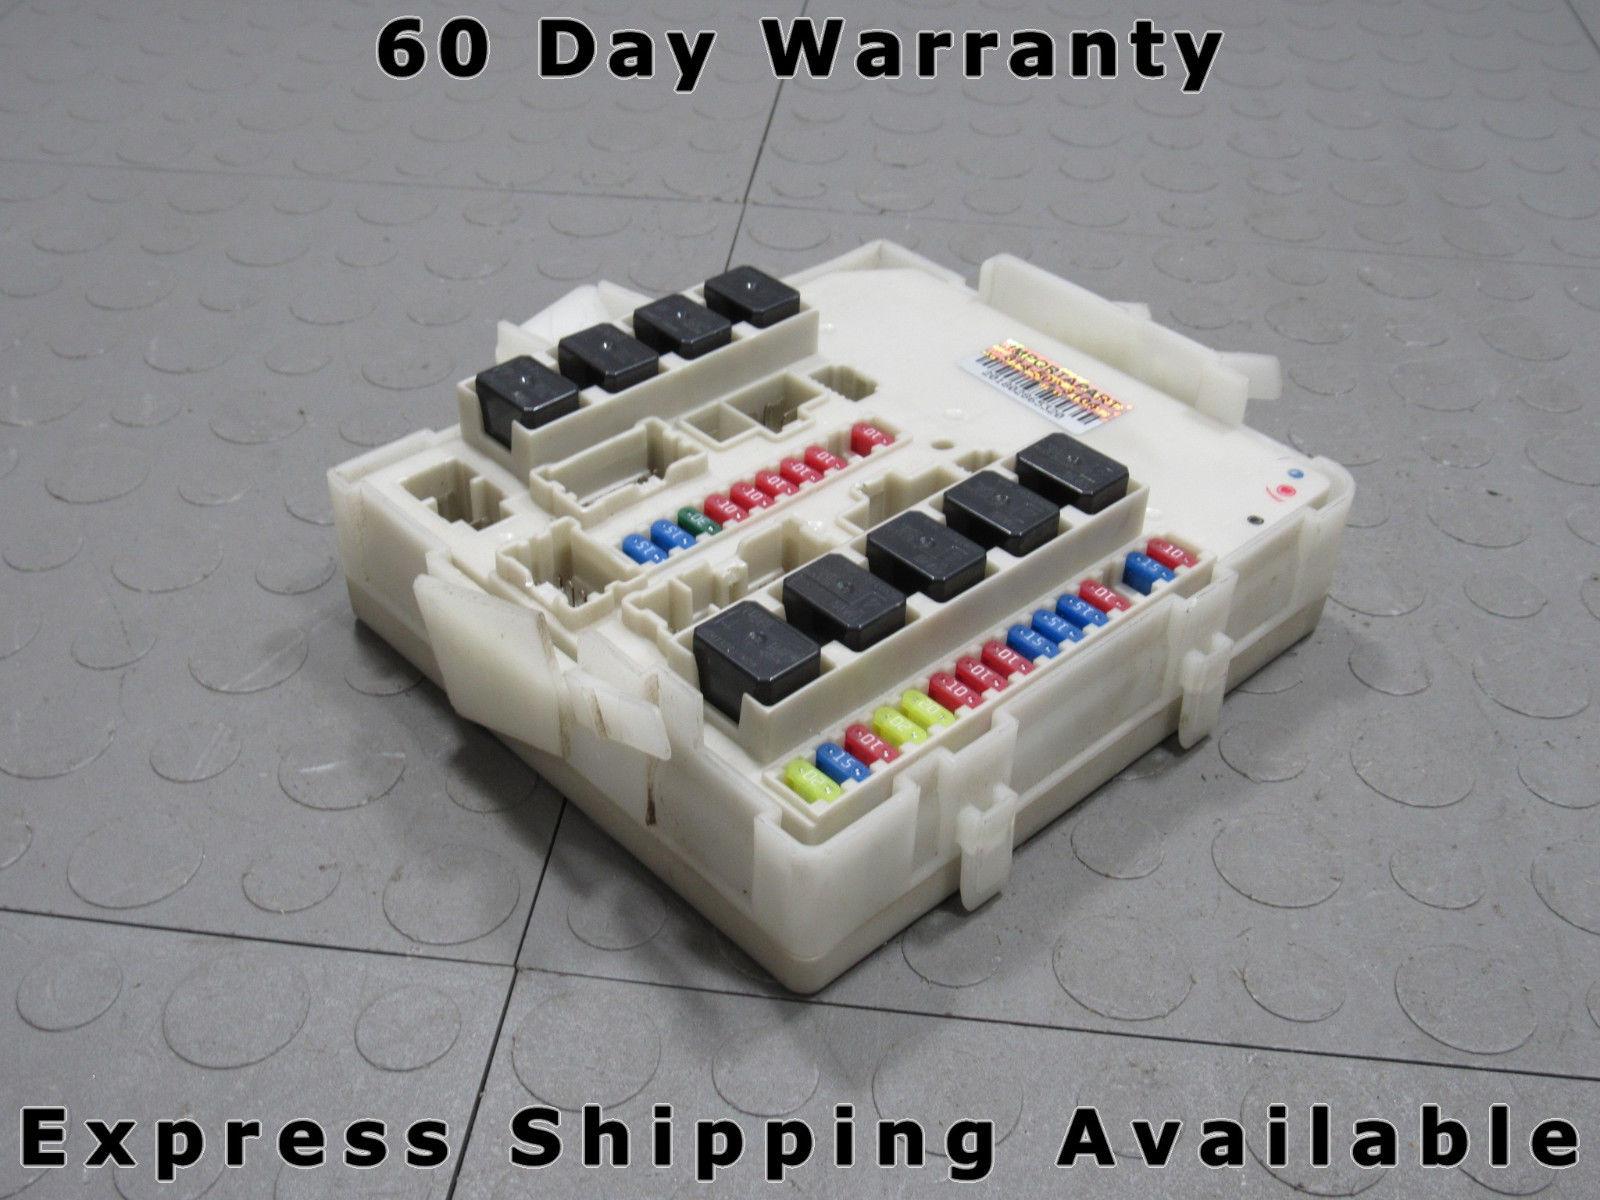 04 06 titan armada xterra qx56 ipdm bcm body module fuse box 284b7 qx4 fuse box 04 06 titan armada xterra qx56 ipdm bcm body module fuse box 284b7 7s002 hb